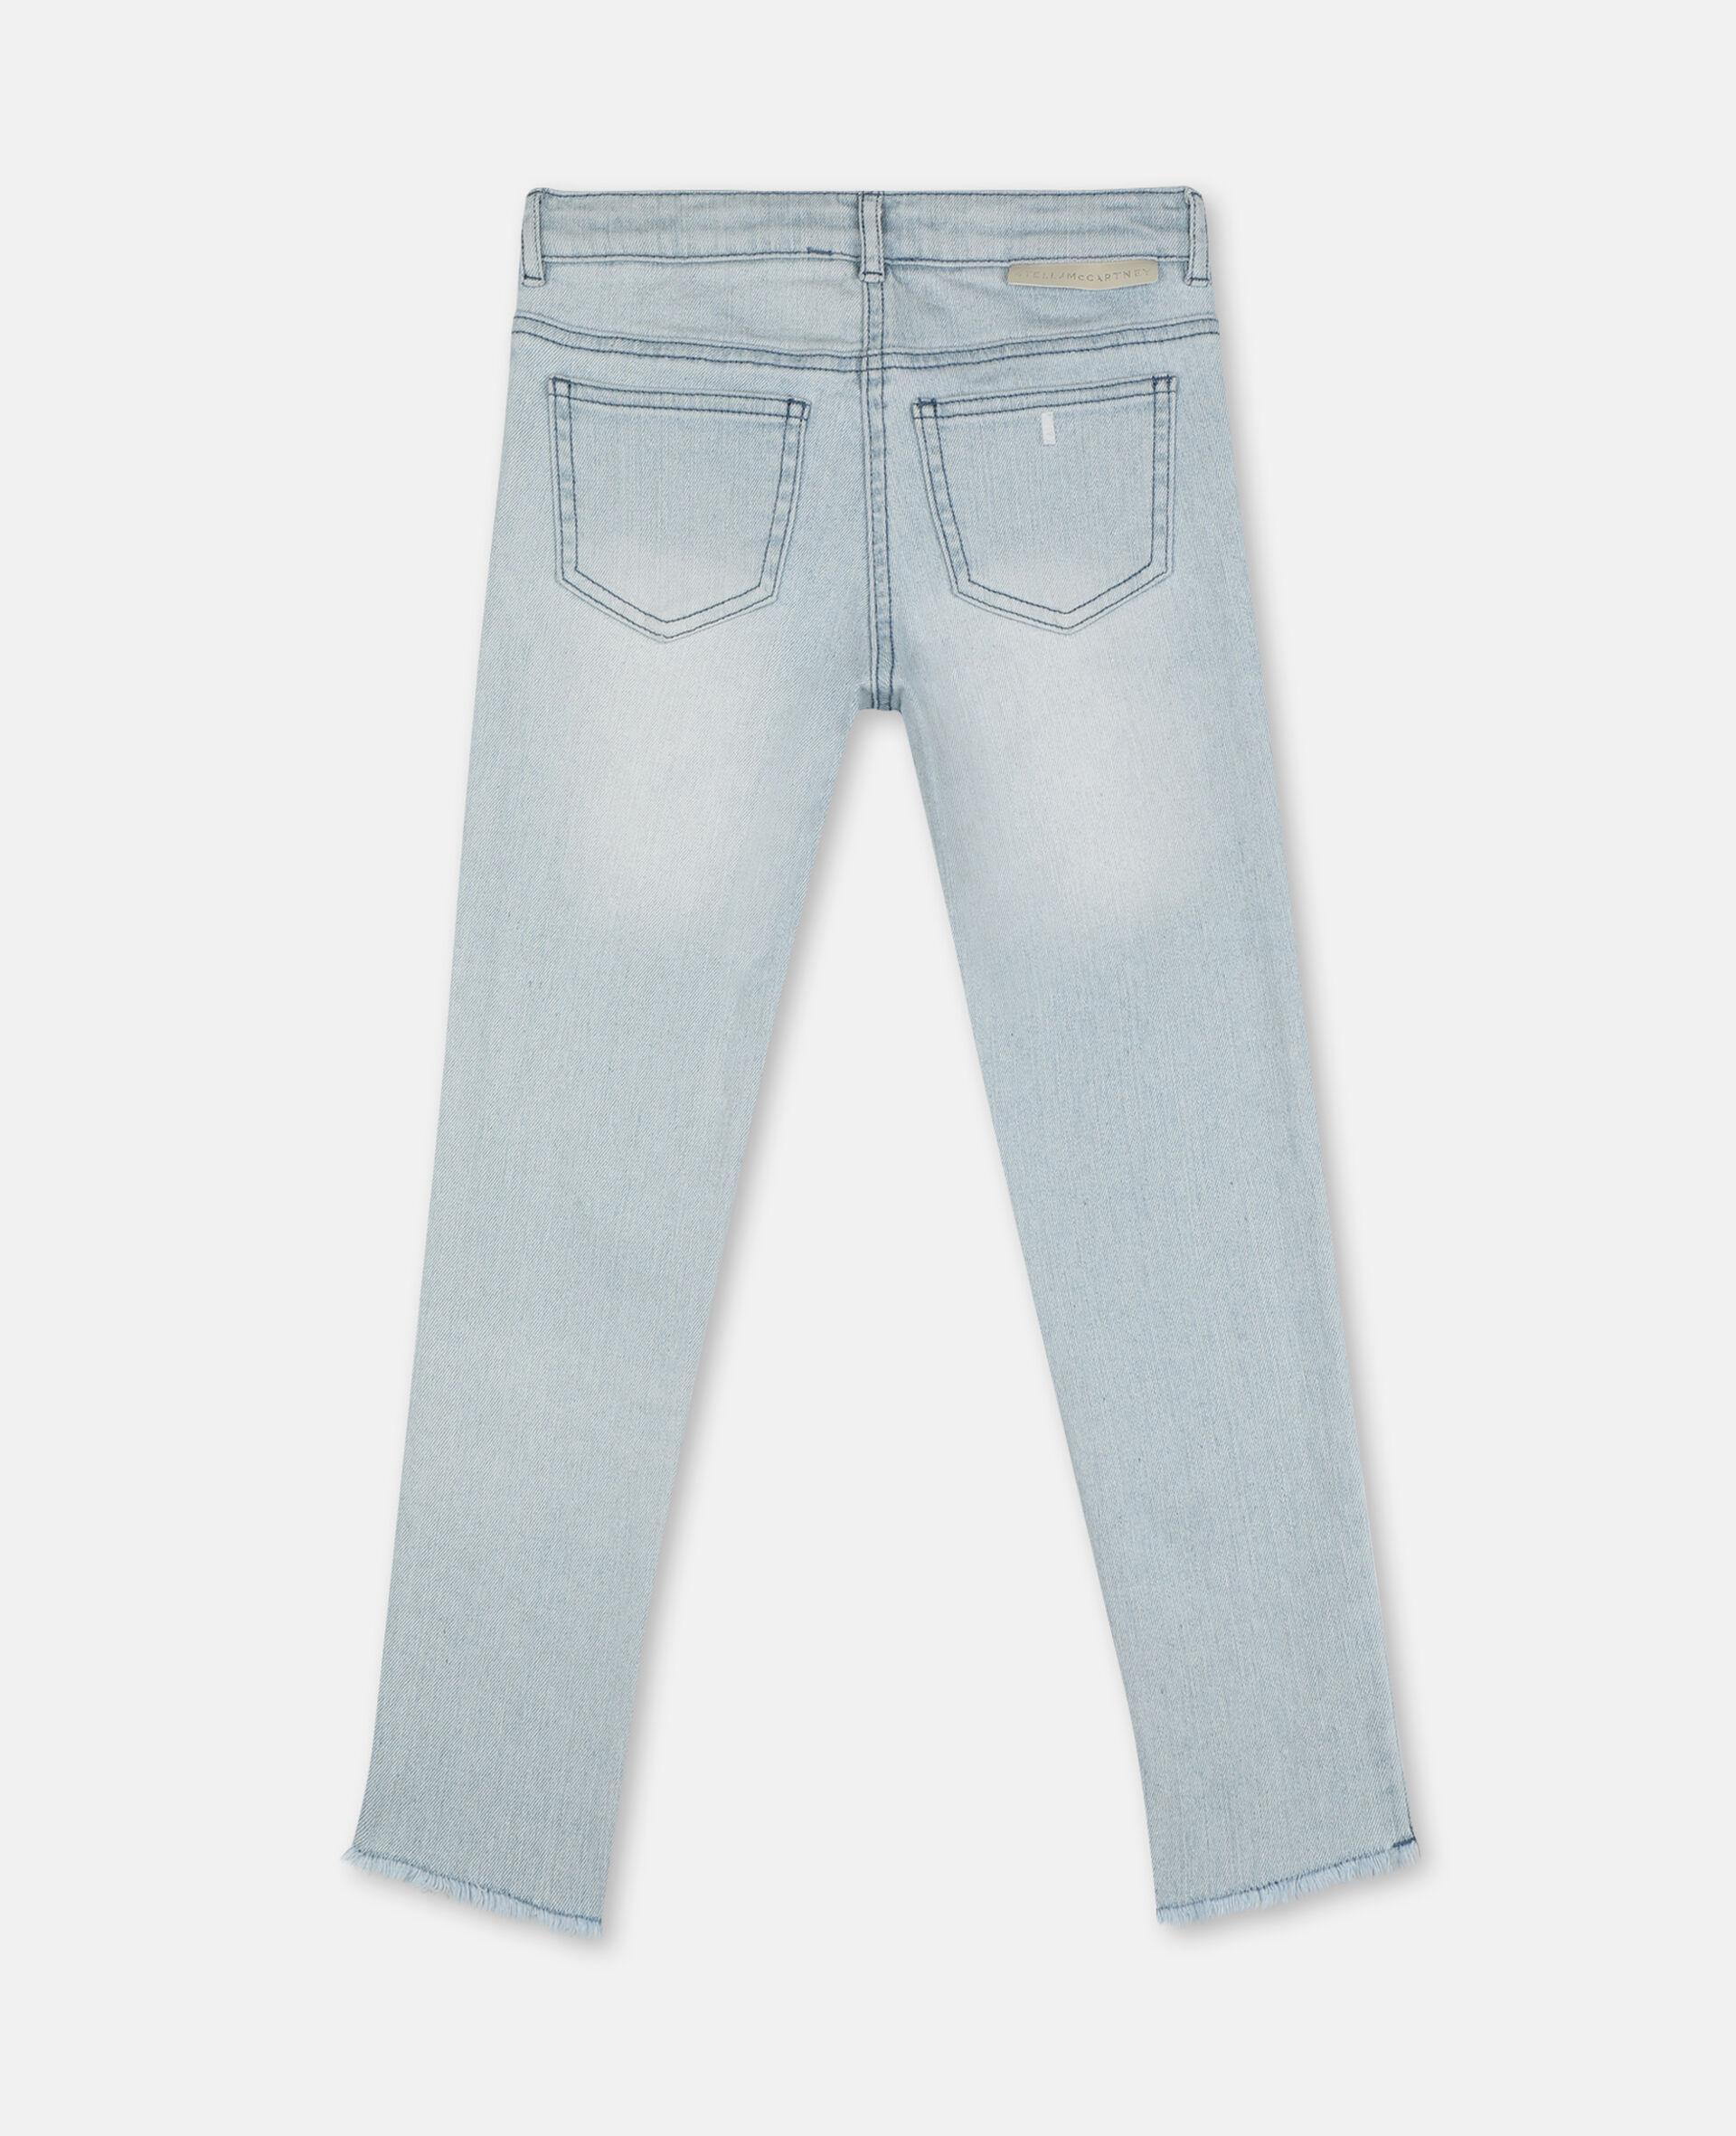 Skinny Denim Trousers-Blue-large image number 3